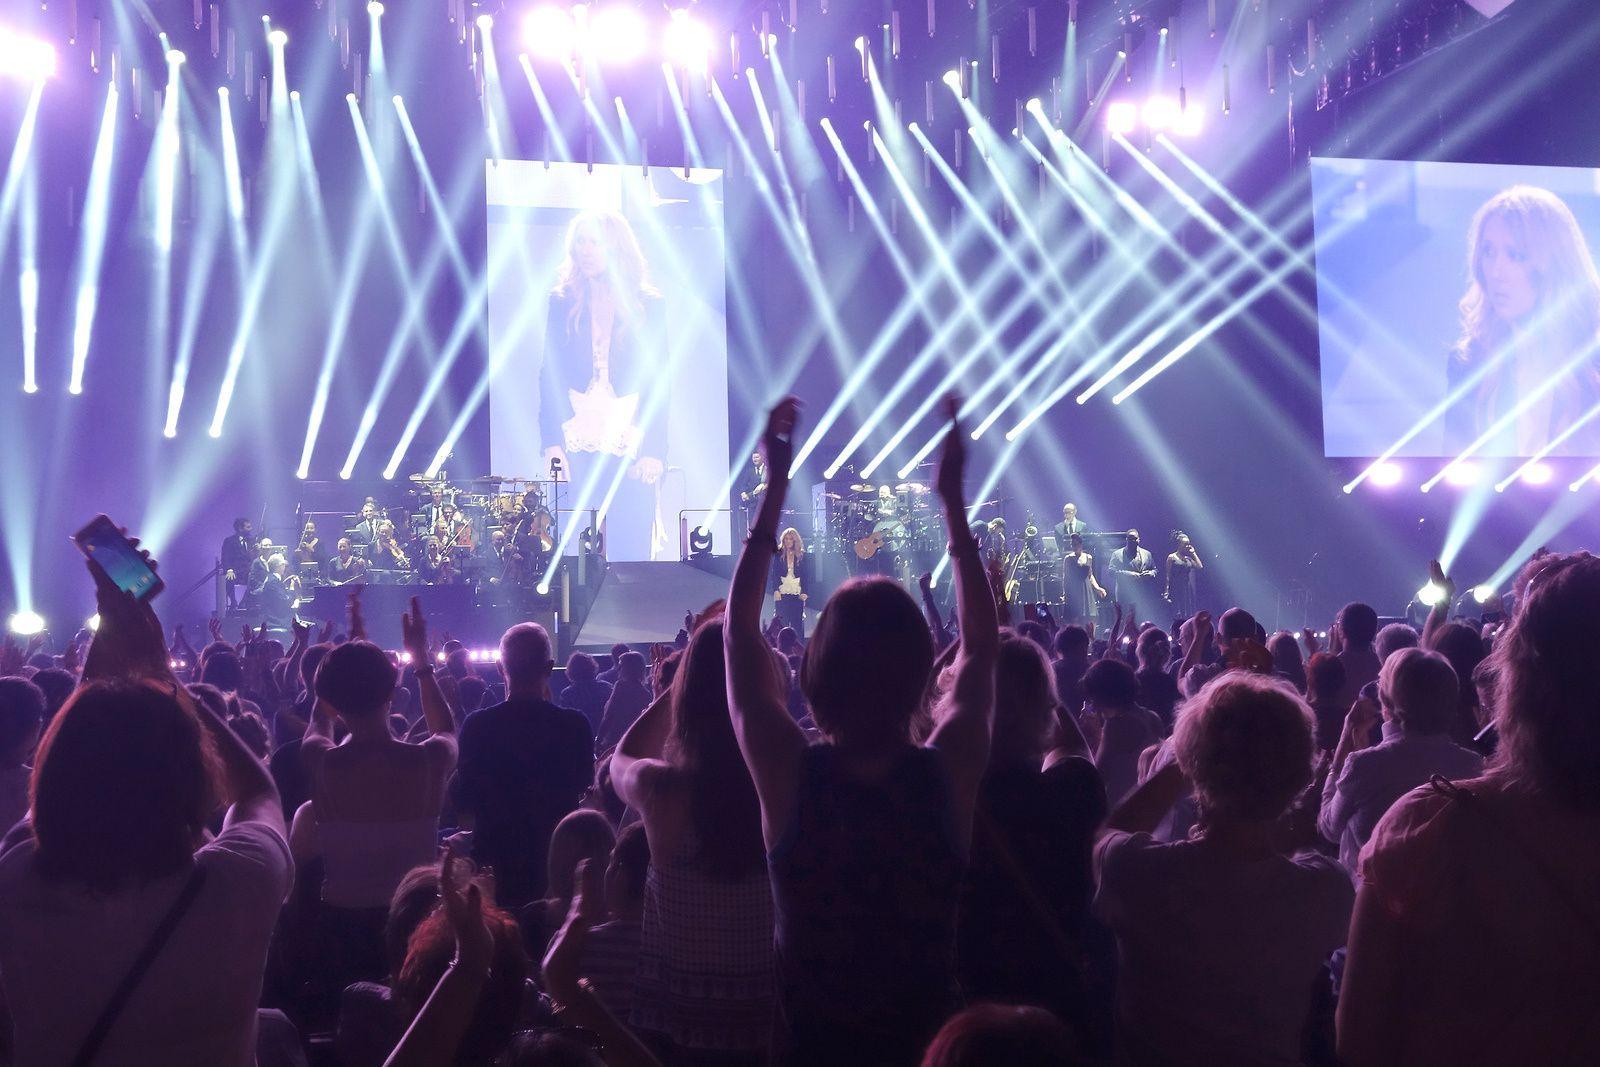 CELINE DION à l'Accor Hotels Arena Bercy (7/7/2016)